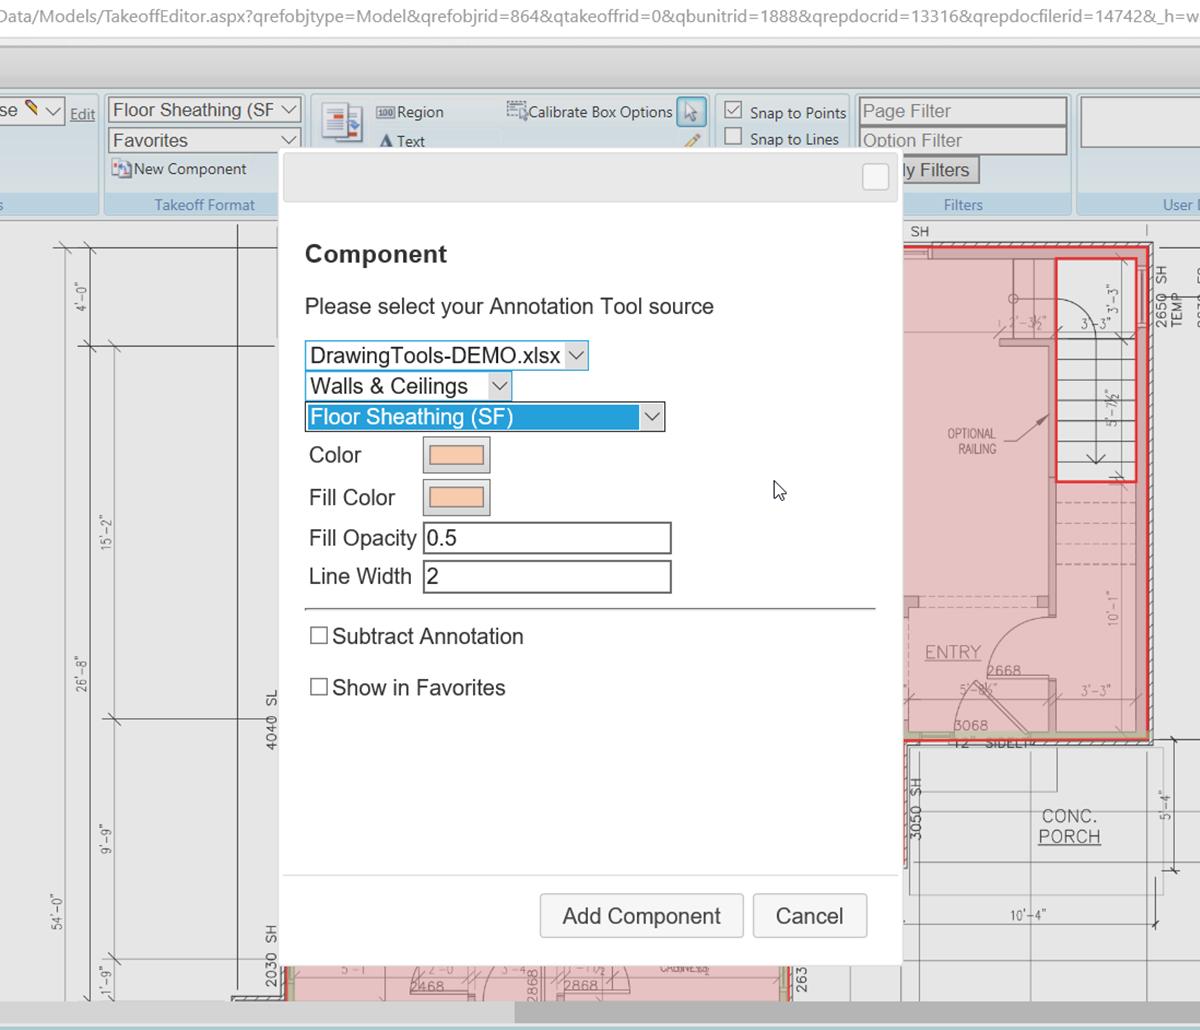 MiTek KOVA Trace Software - Screenshot of KOVA Trace software